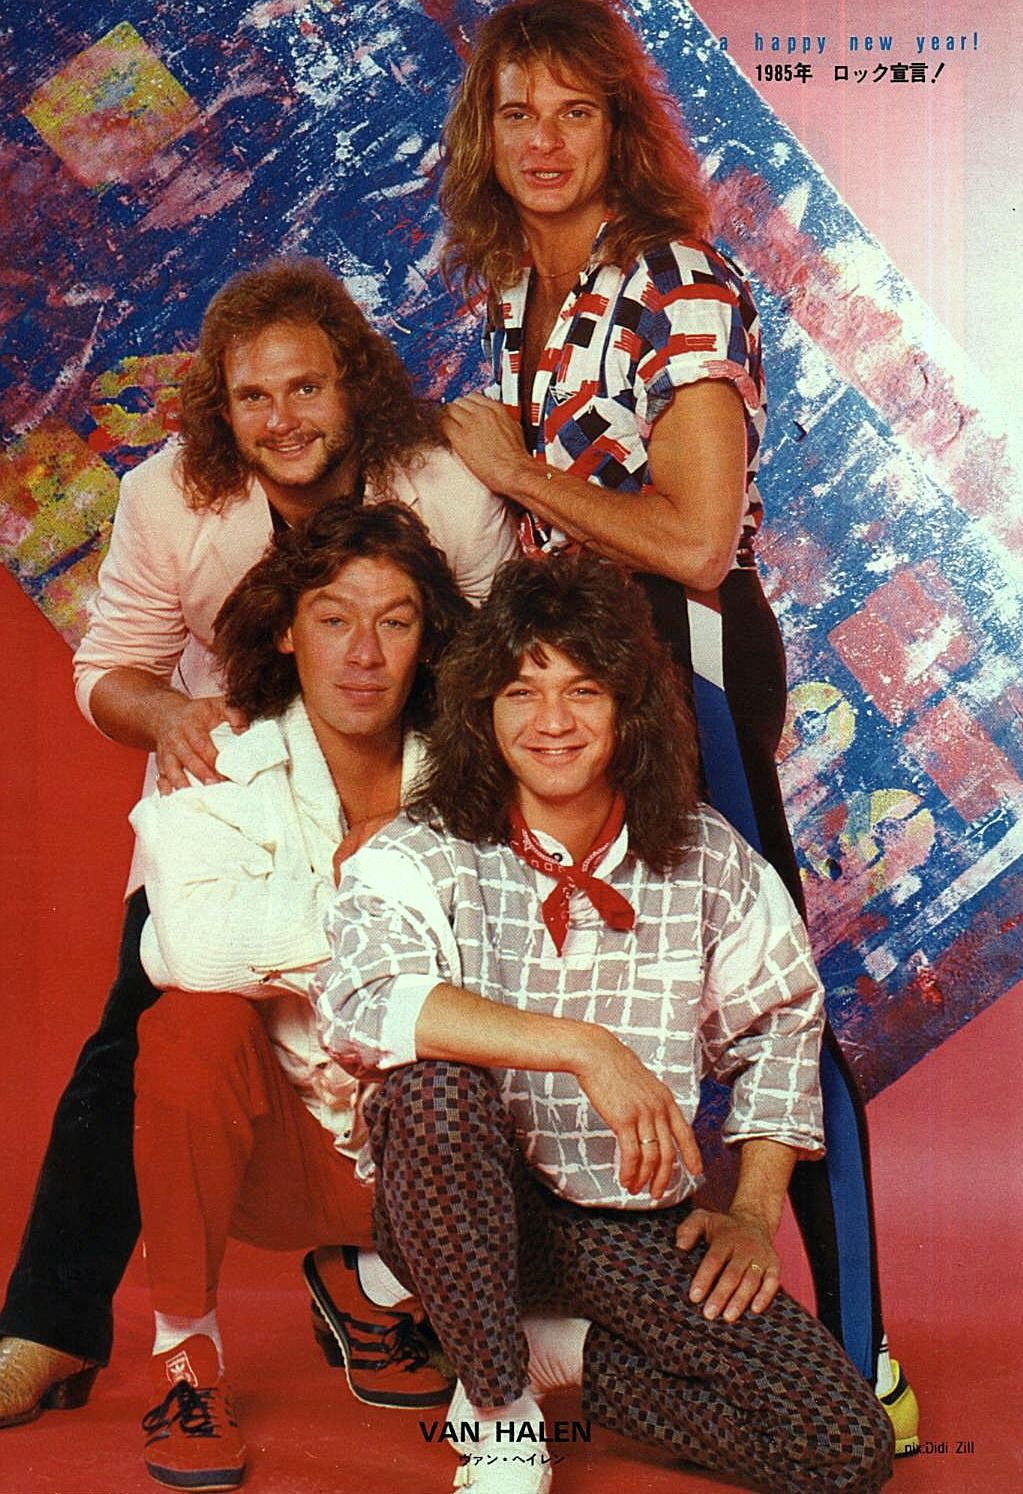 Pin By M S On Van Halen In 2020 Eddie Van Halen Van Halen Goth Music